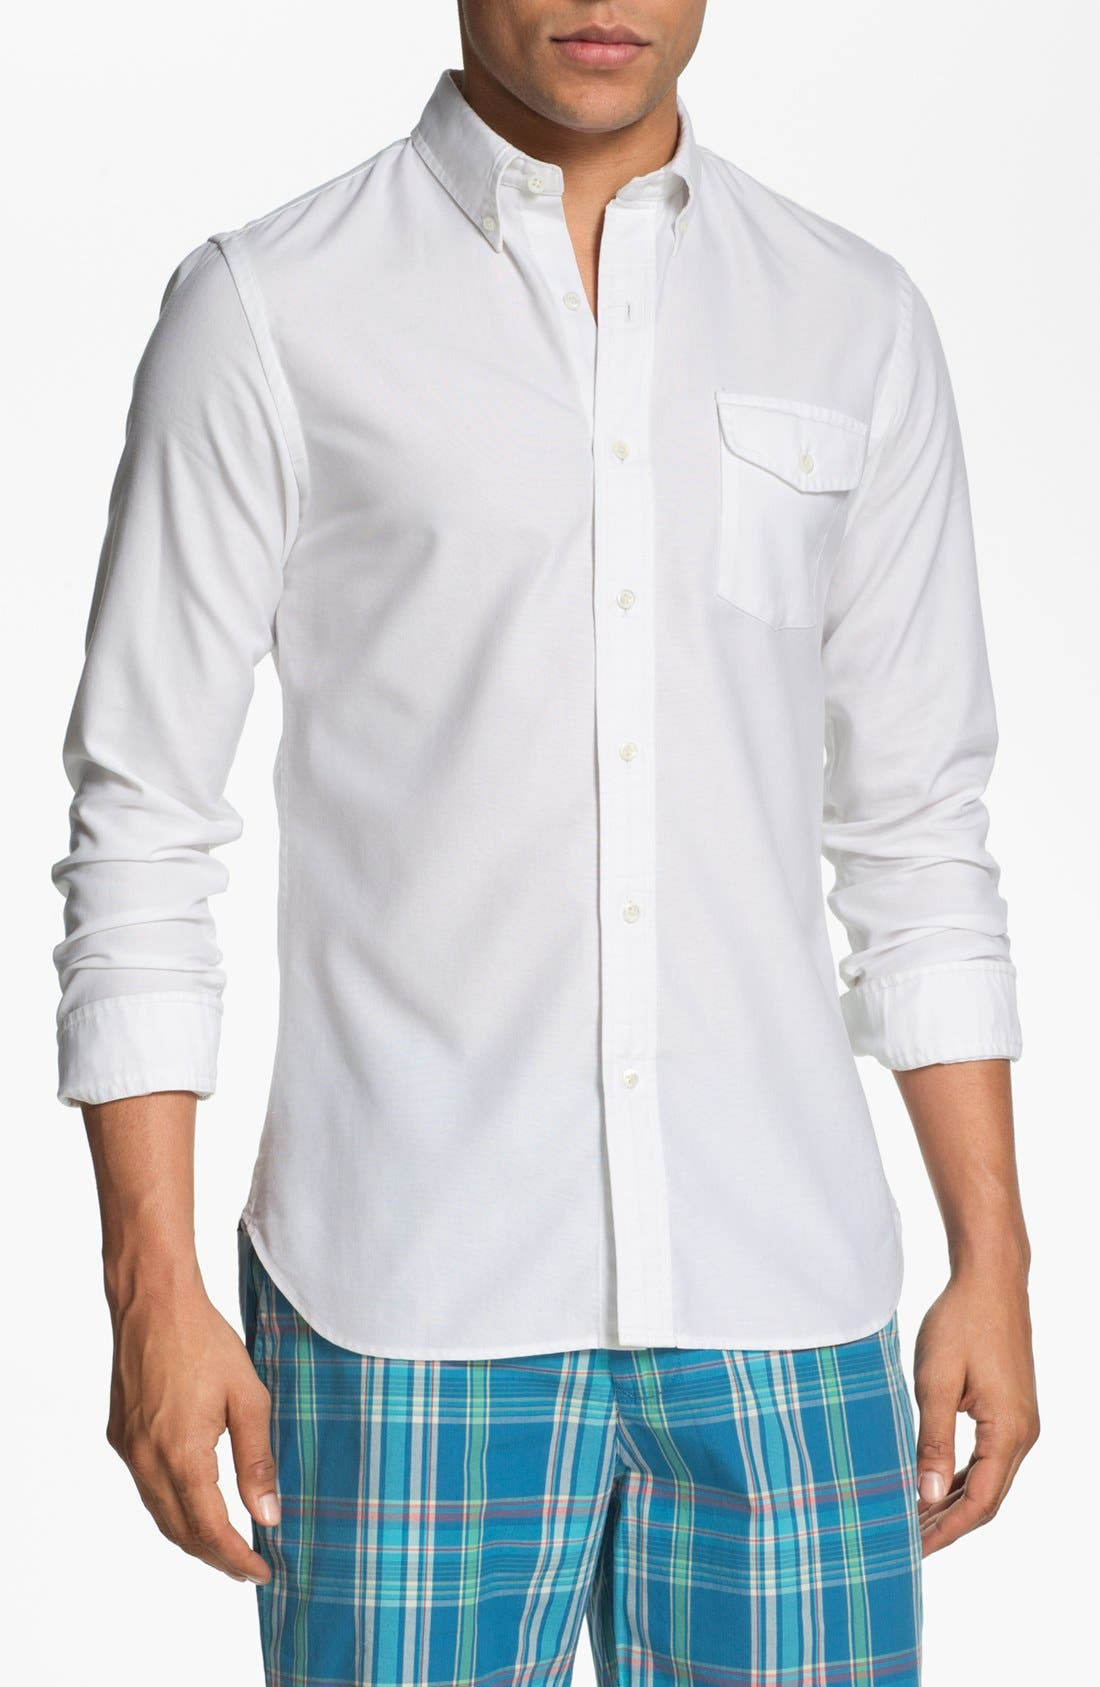 Main Image - J. Press York Street Regular Fit Oxford Sport Shirt